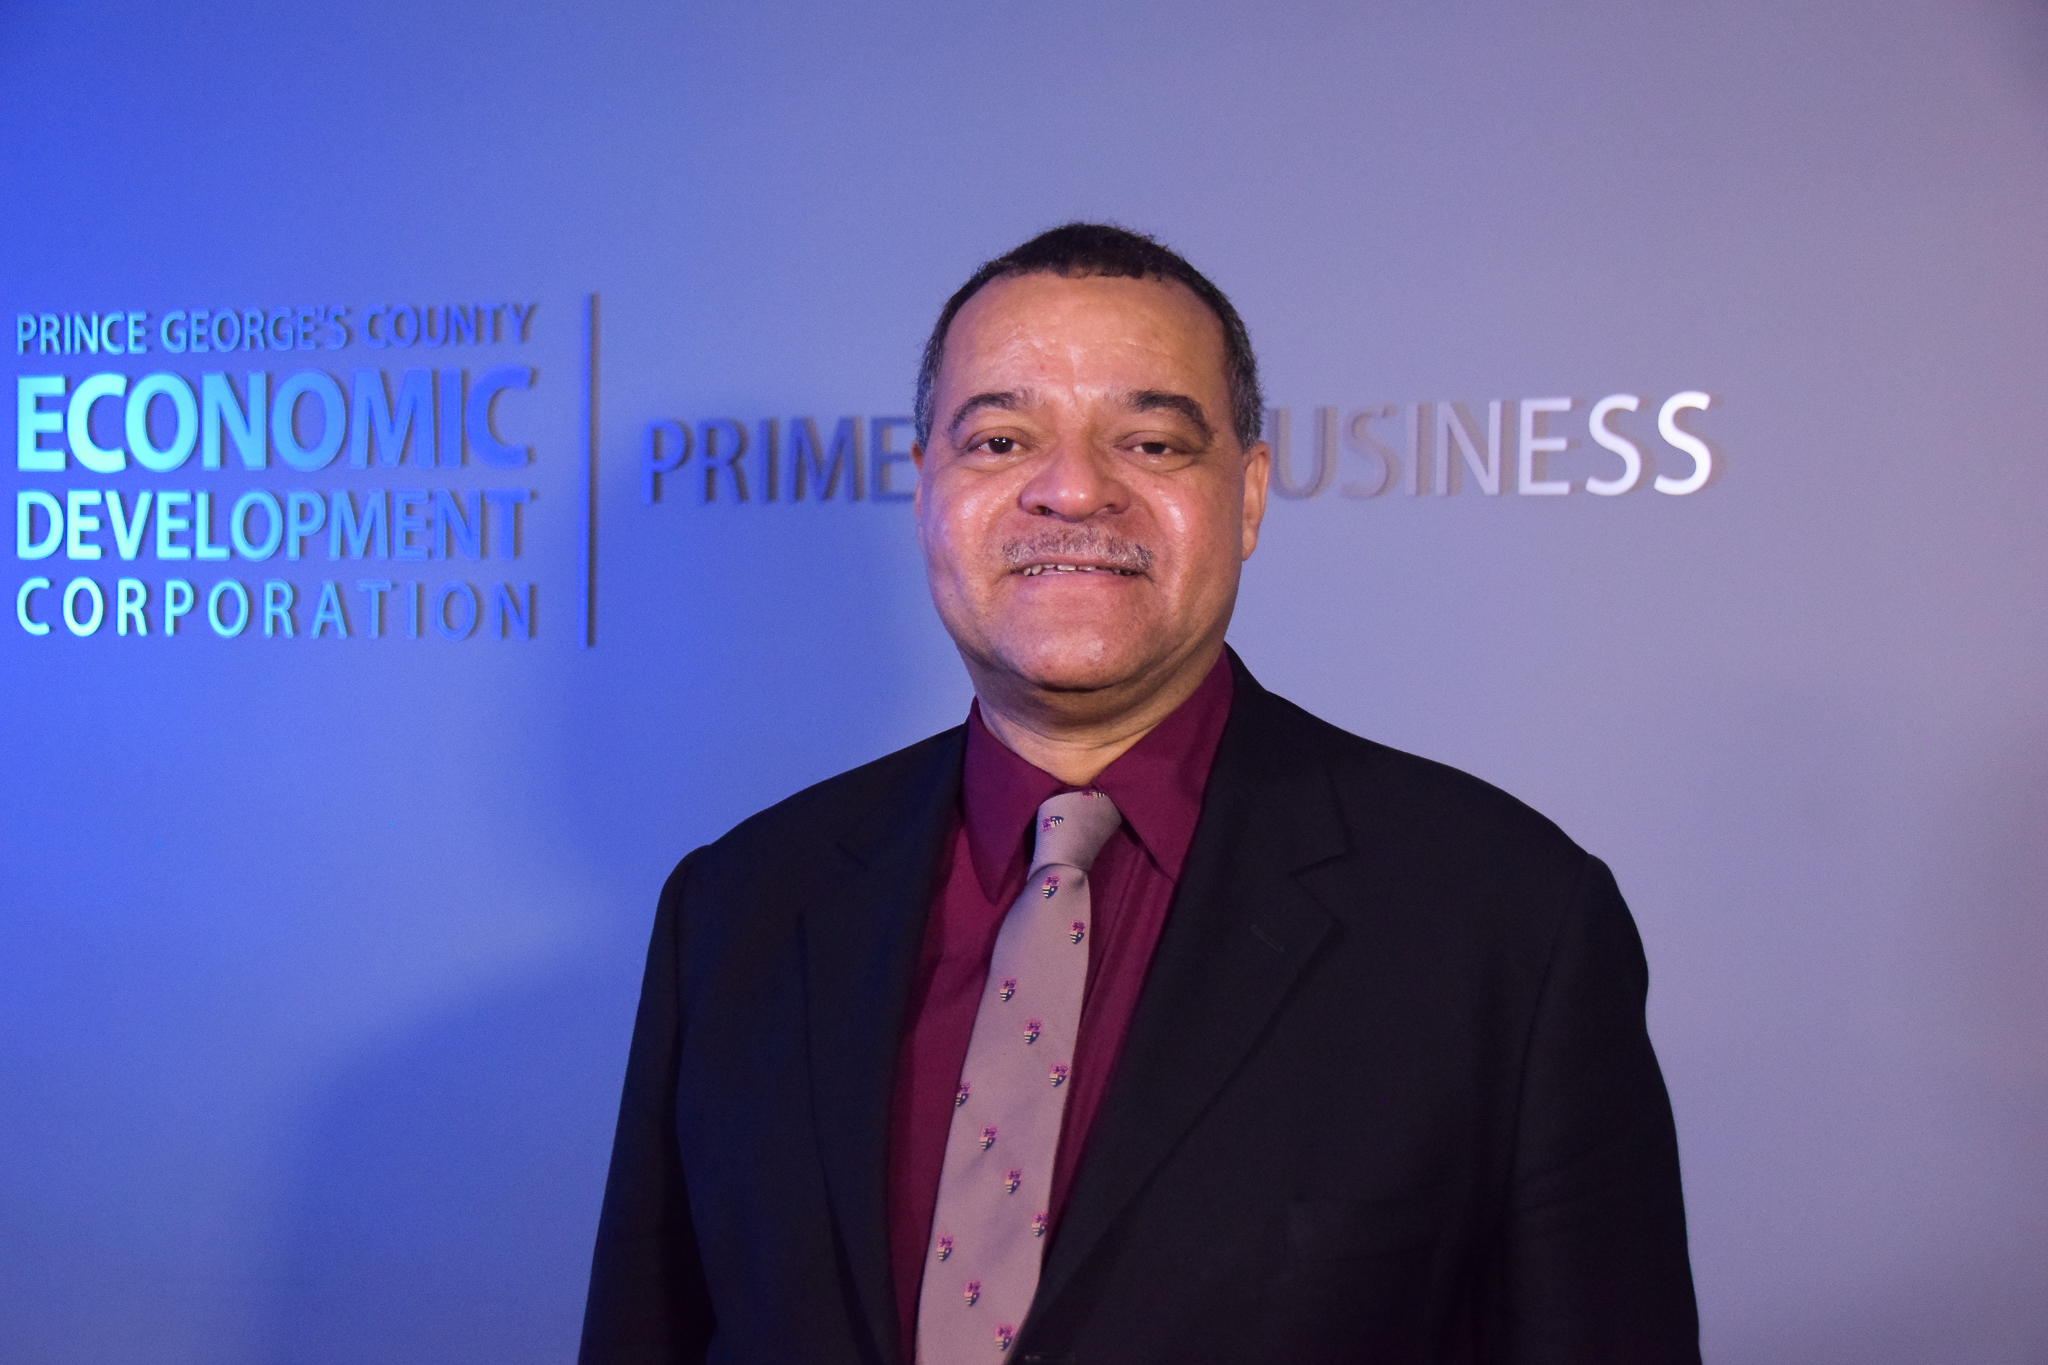 David K. Lewis - Director of Economic Development301-583-4609